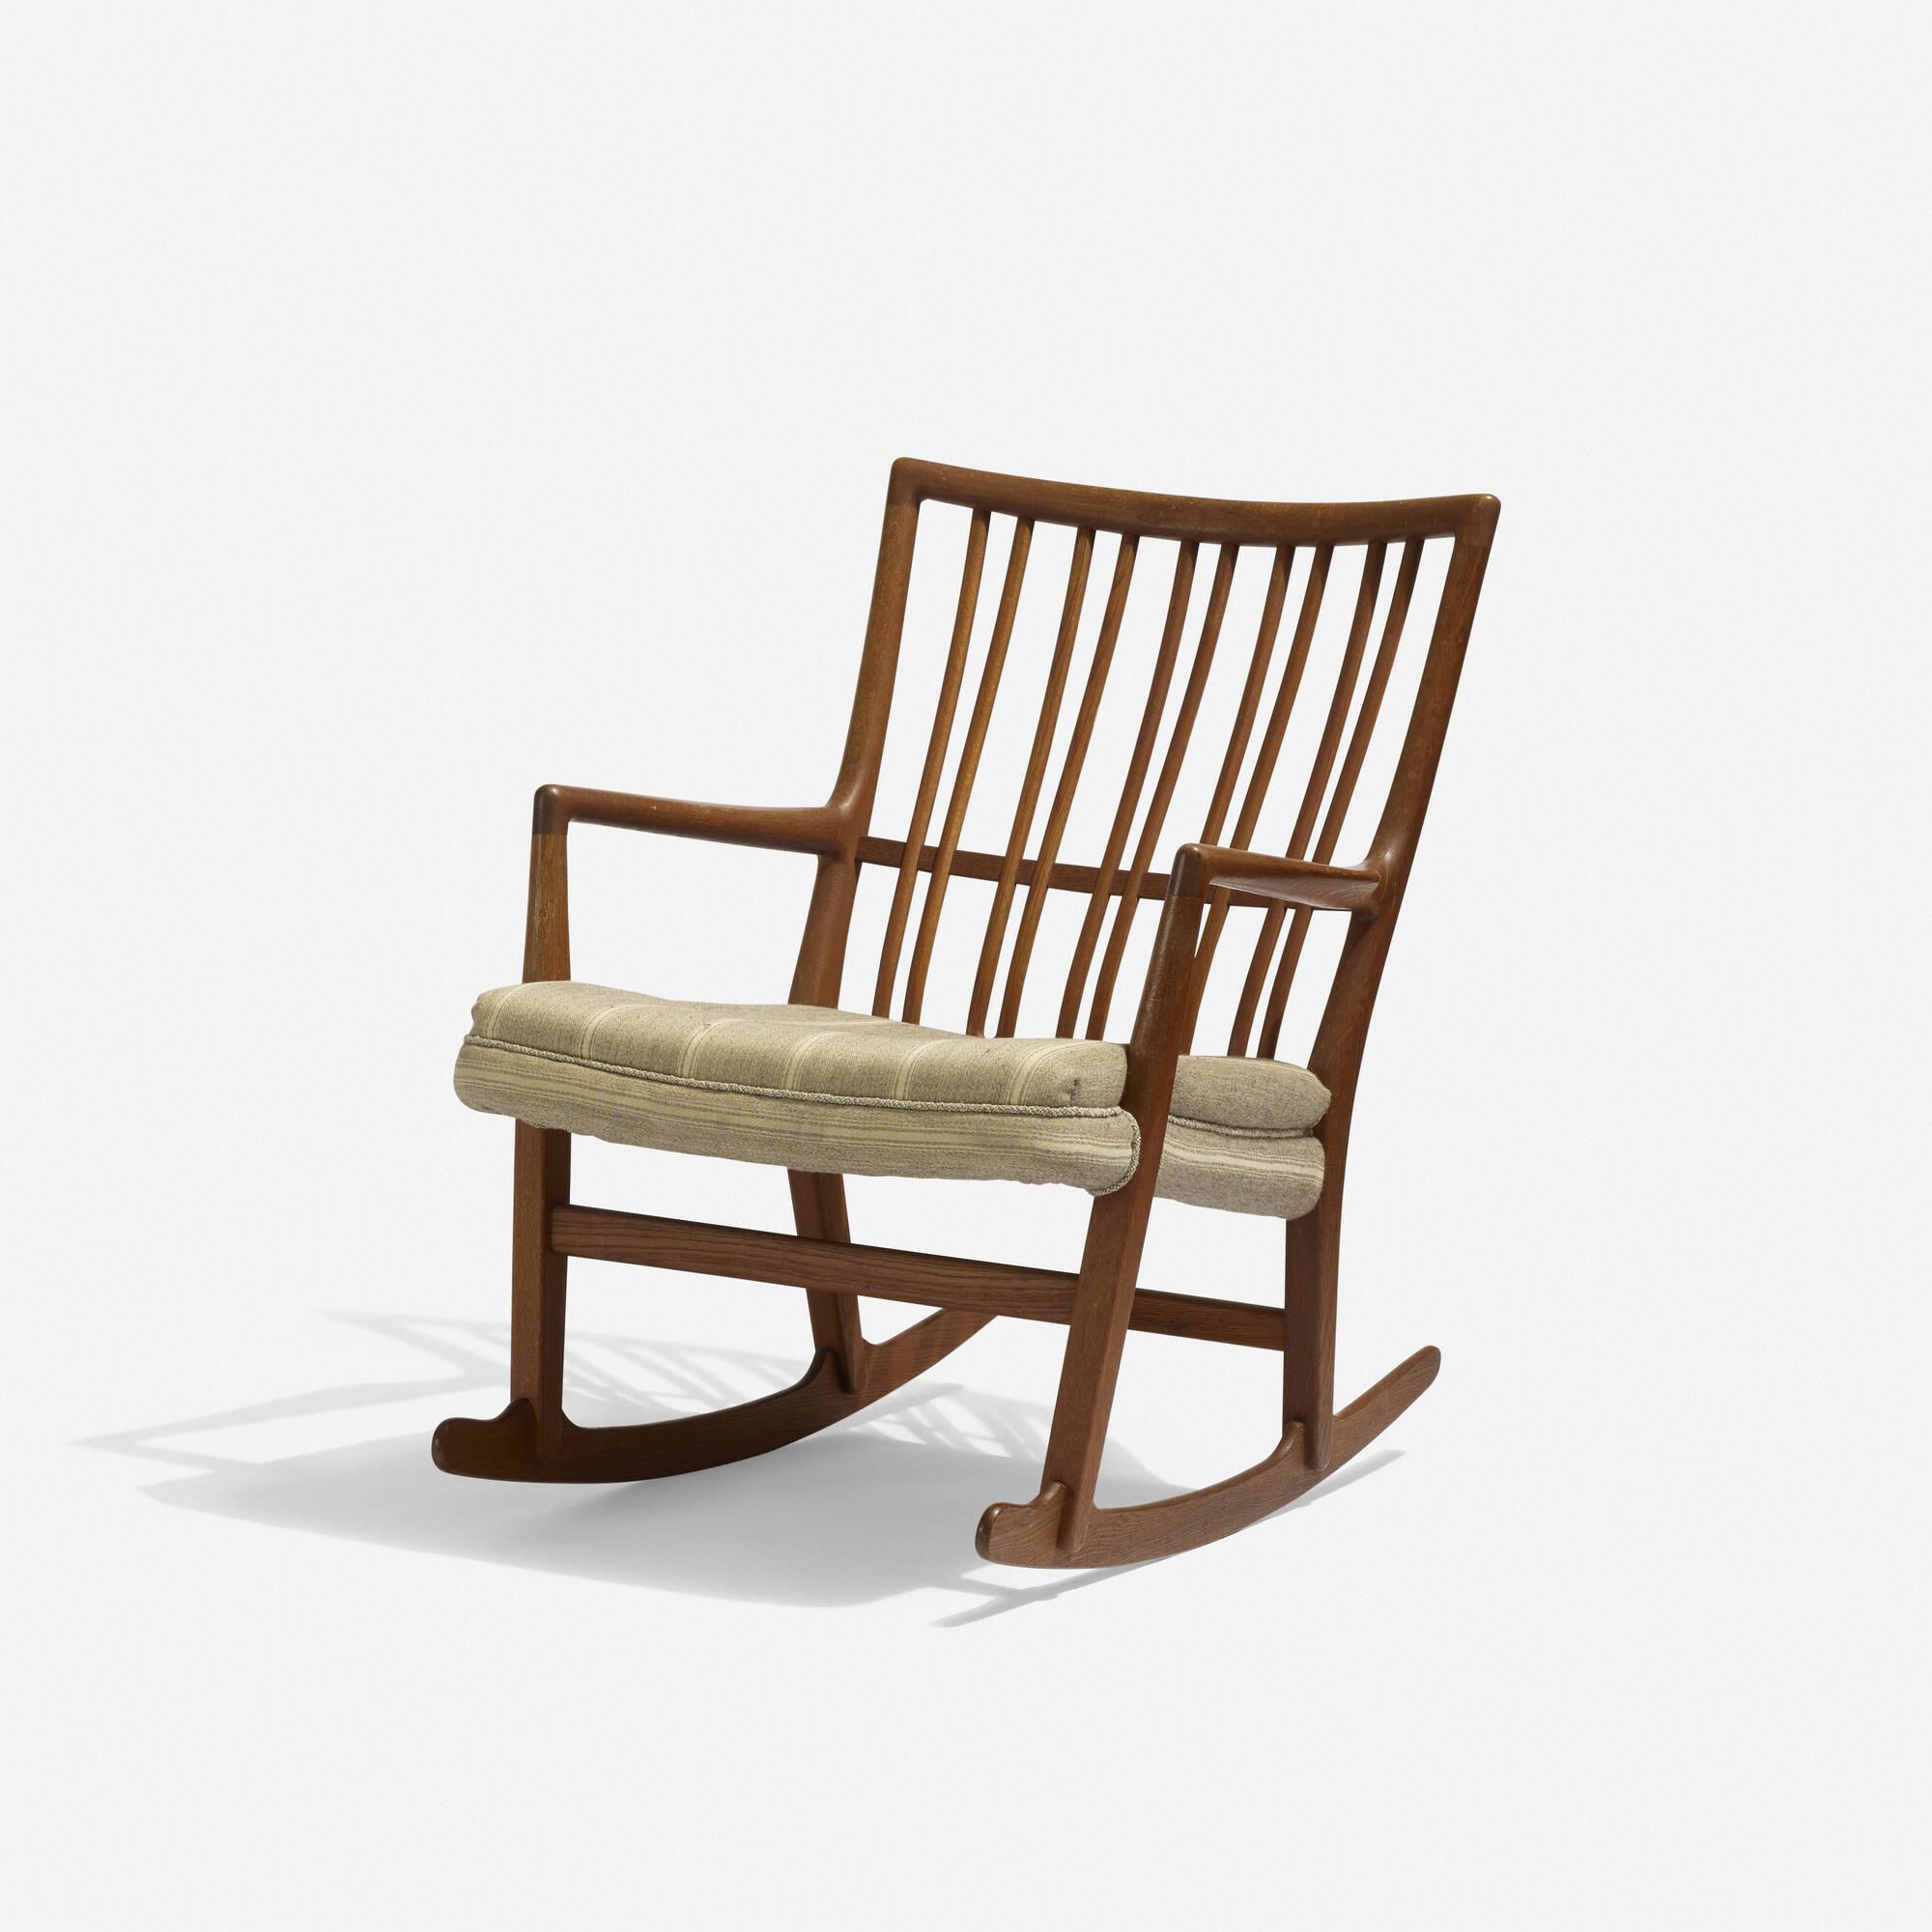 hans wegner rocking chair patio hanging 246 j scandinavian design 26 april 2 of 3